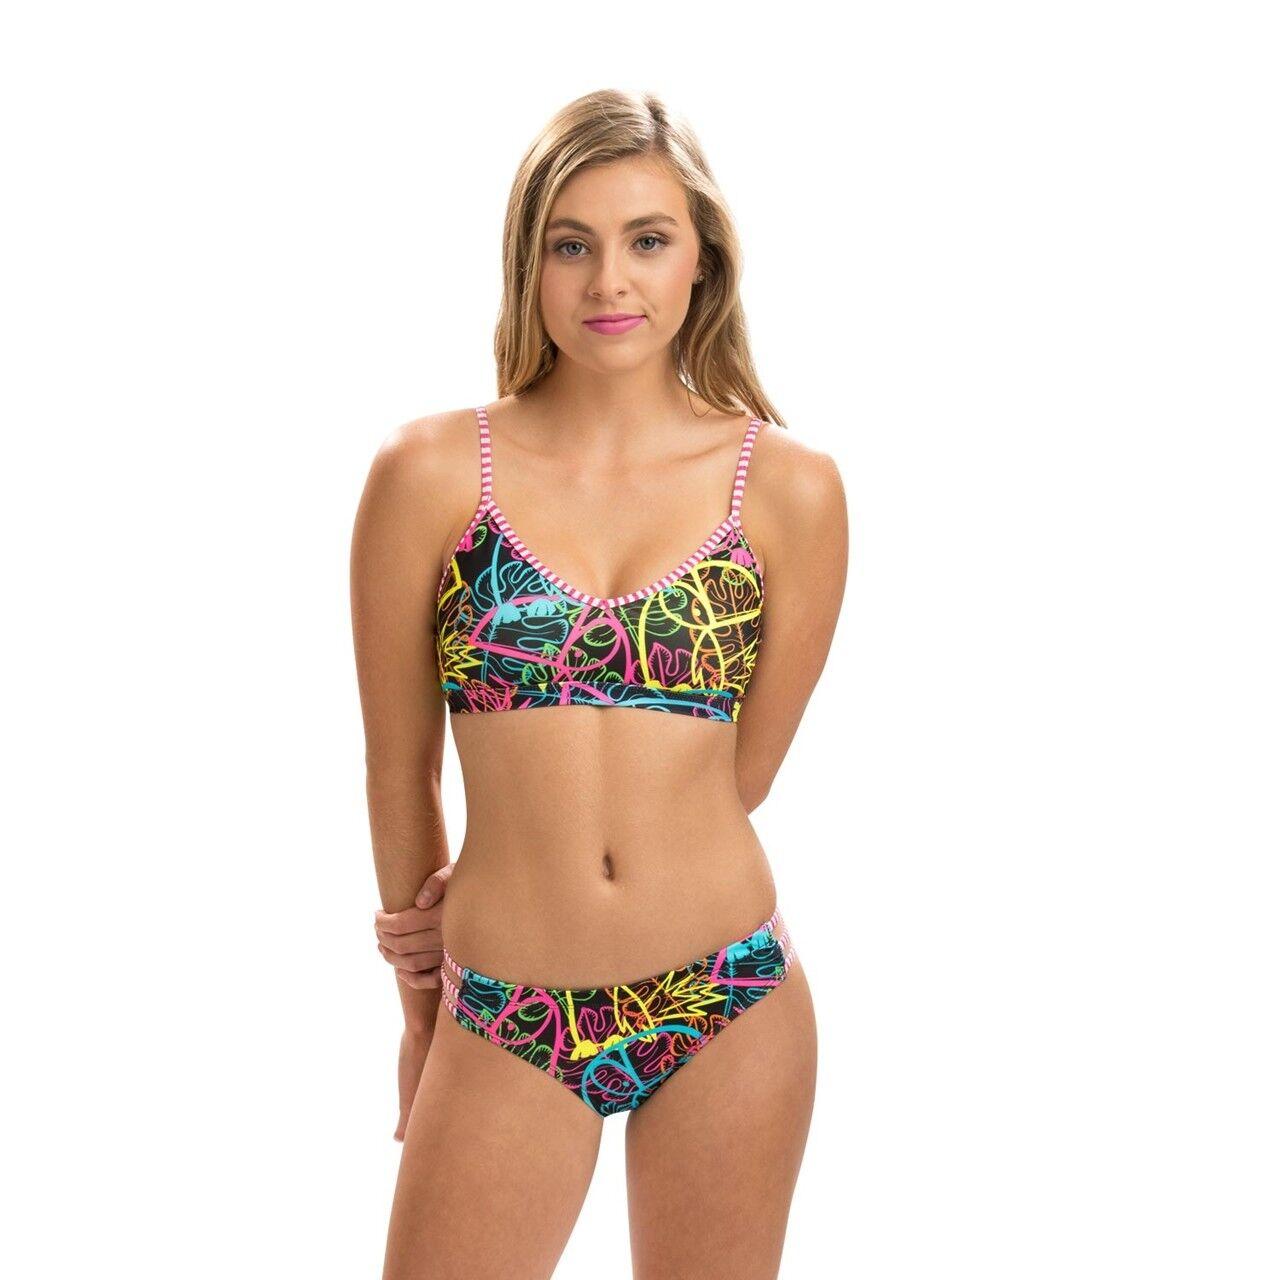 UGLIES Graffiti Jungle Strappy 2 Piece Swimsuit. Dolfin Uglies 2 Piece Swimsuits